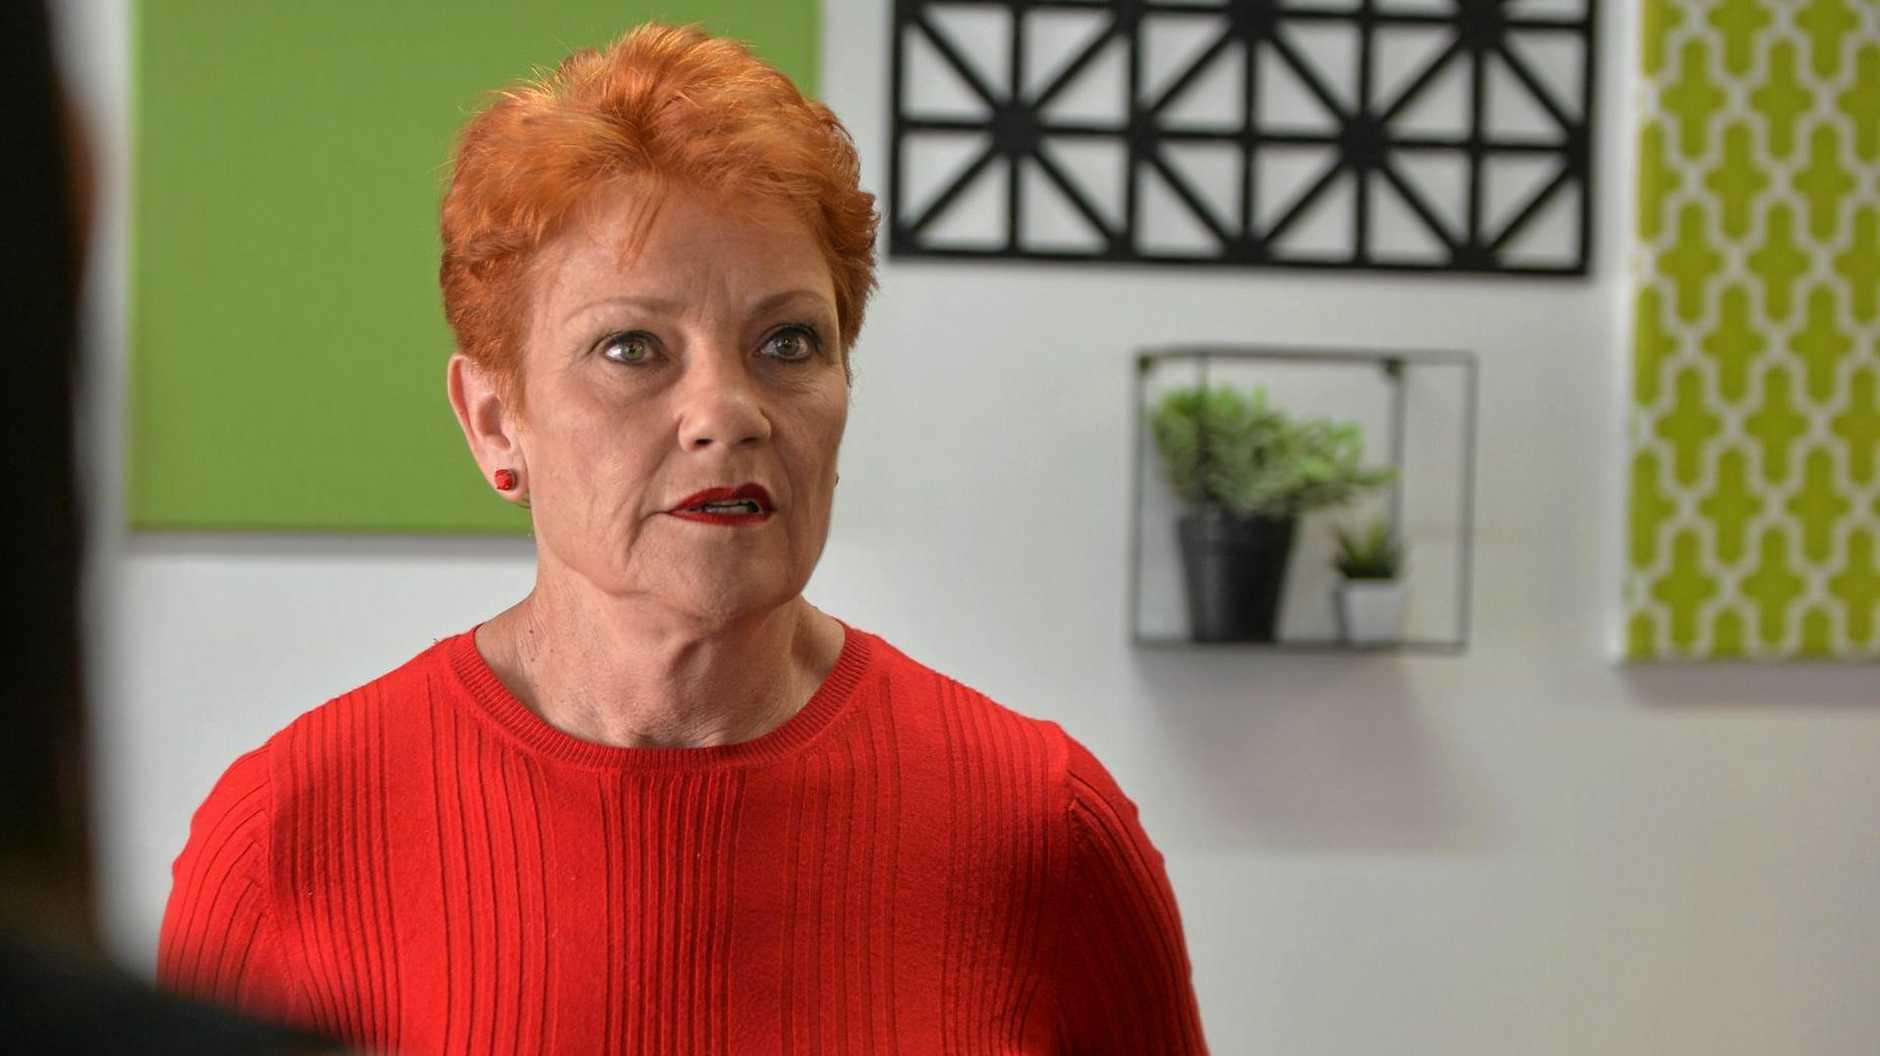 One Nation Senator Pauline Hanson met with community members at the Sarina RSL yesterday.